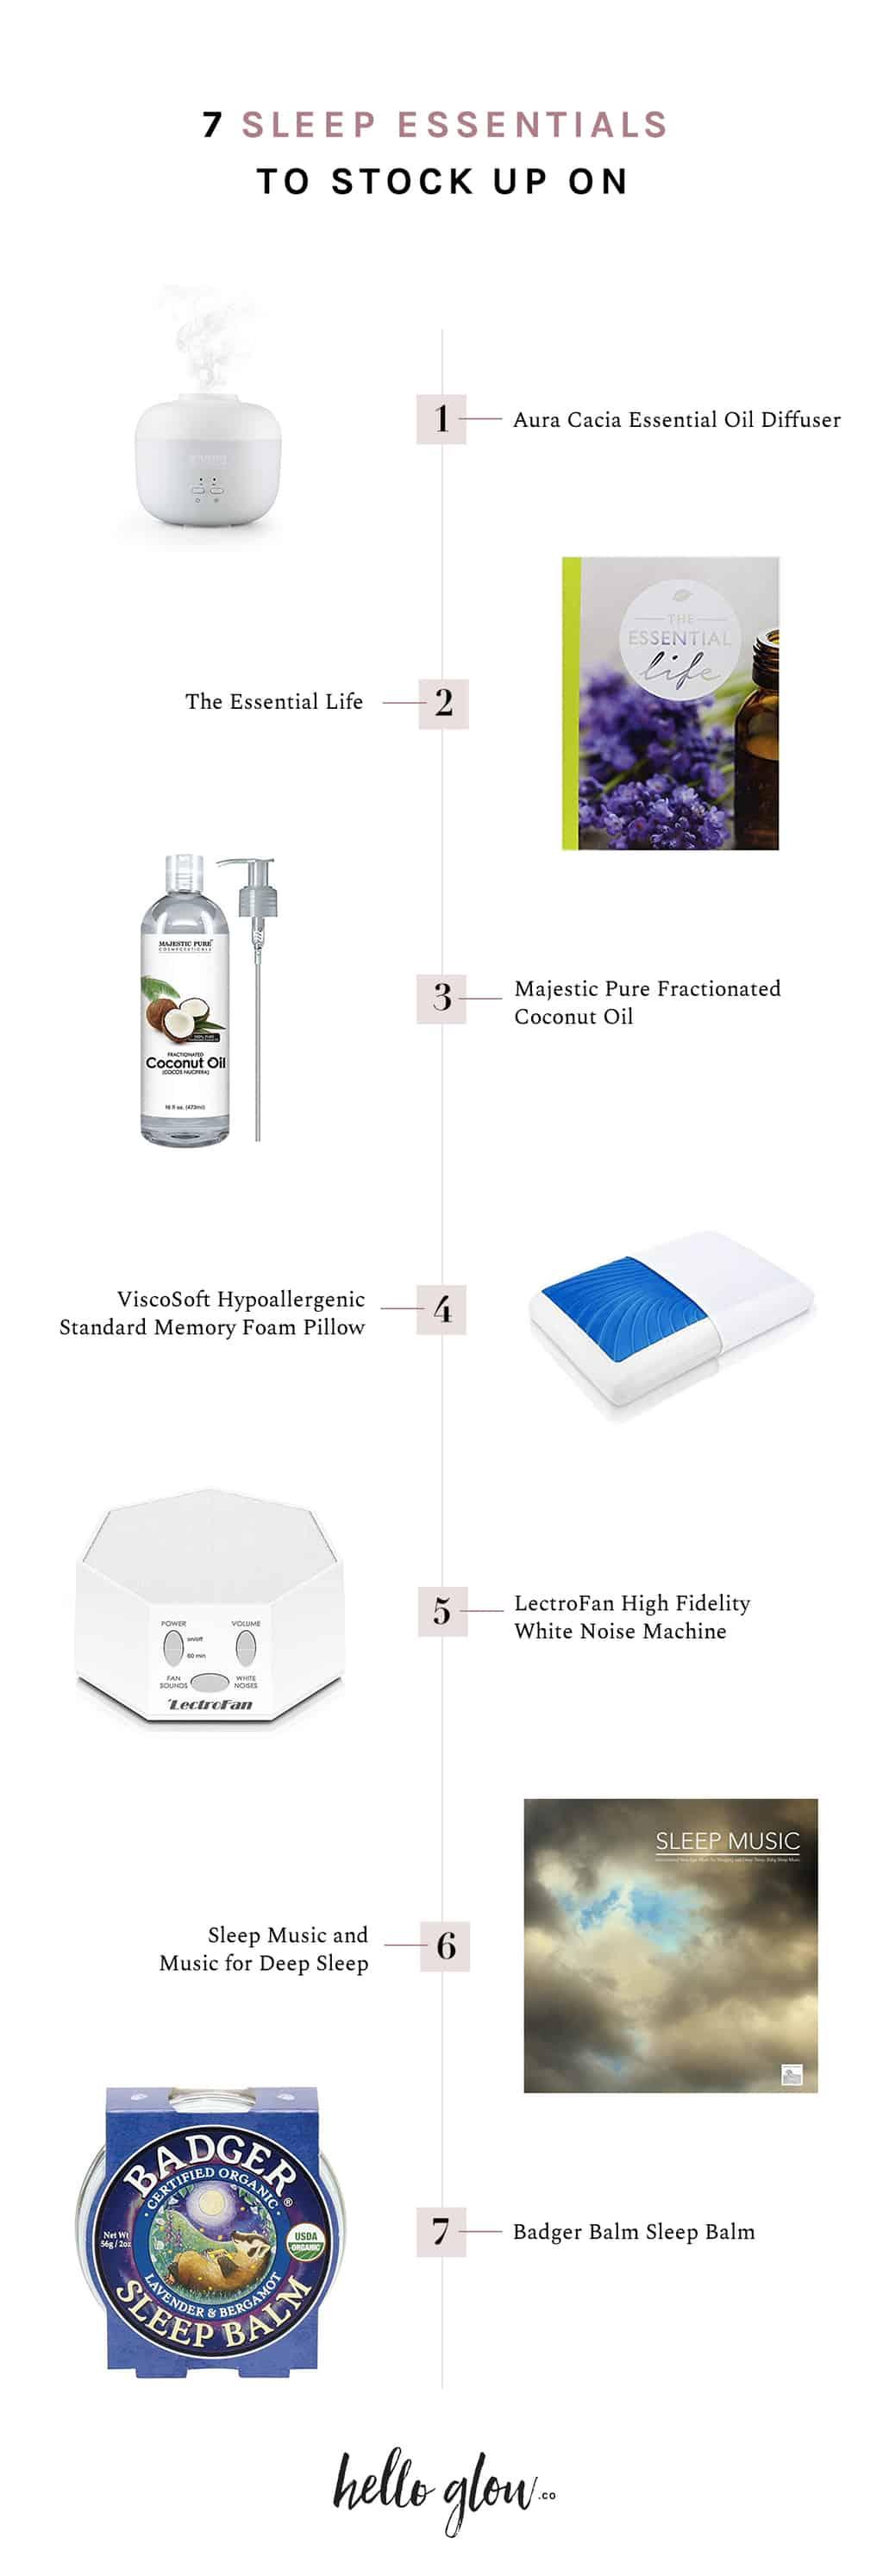 Essentials for a Good Night's Sleep